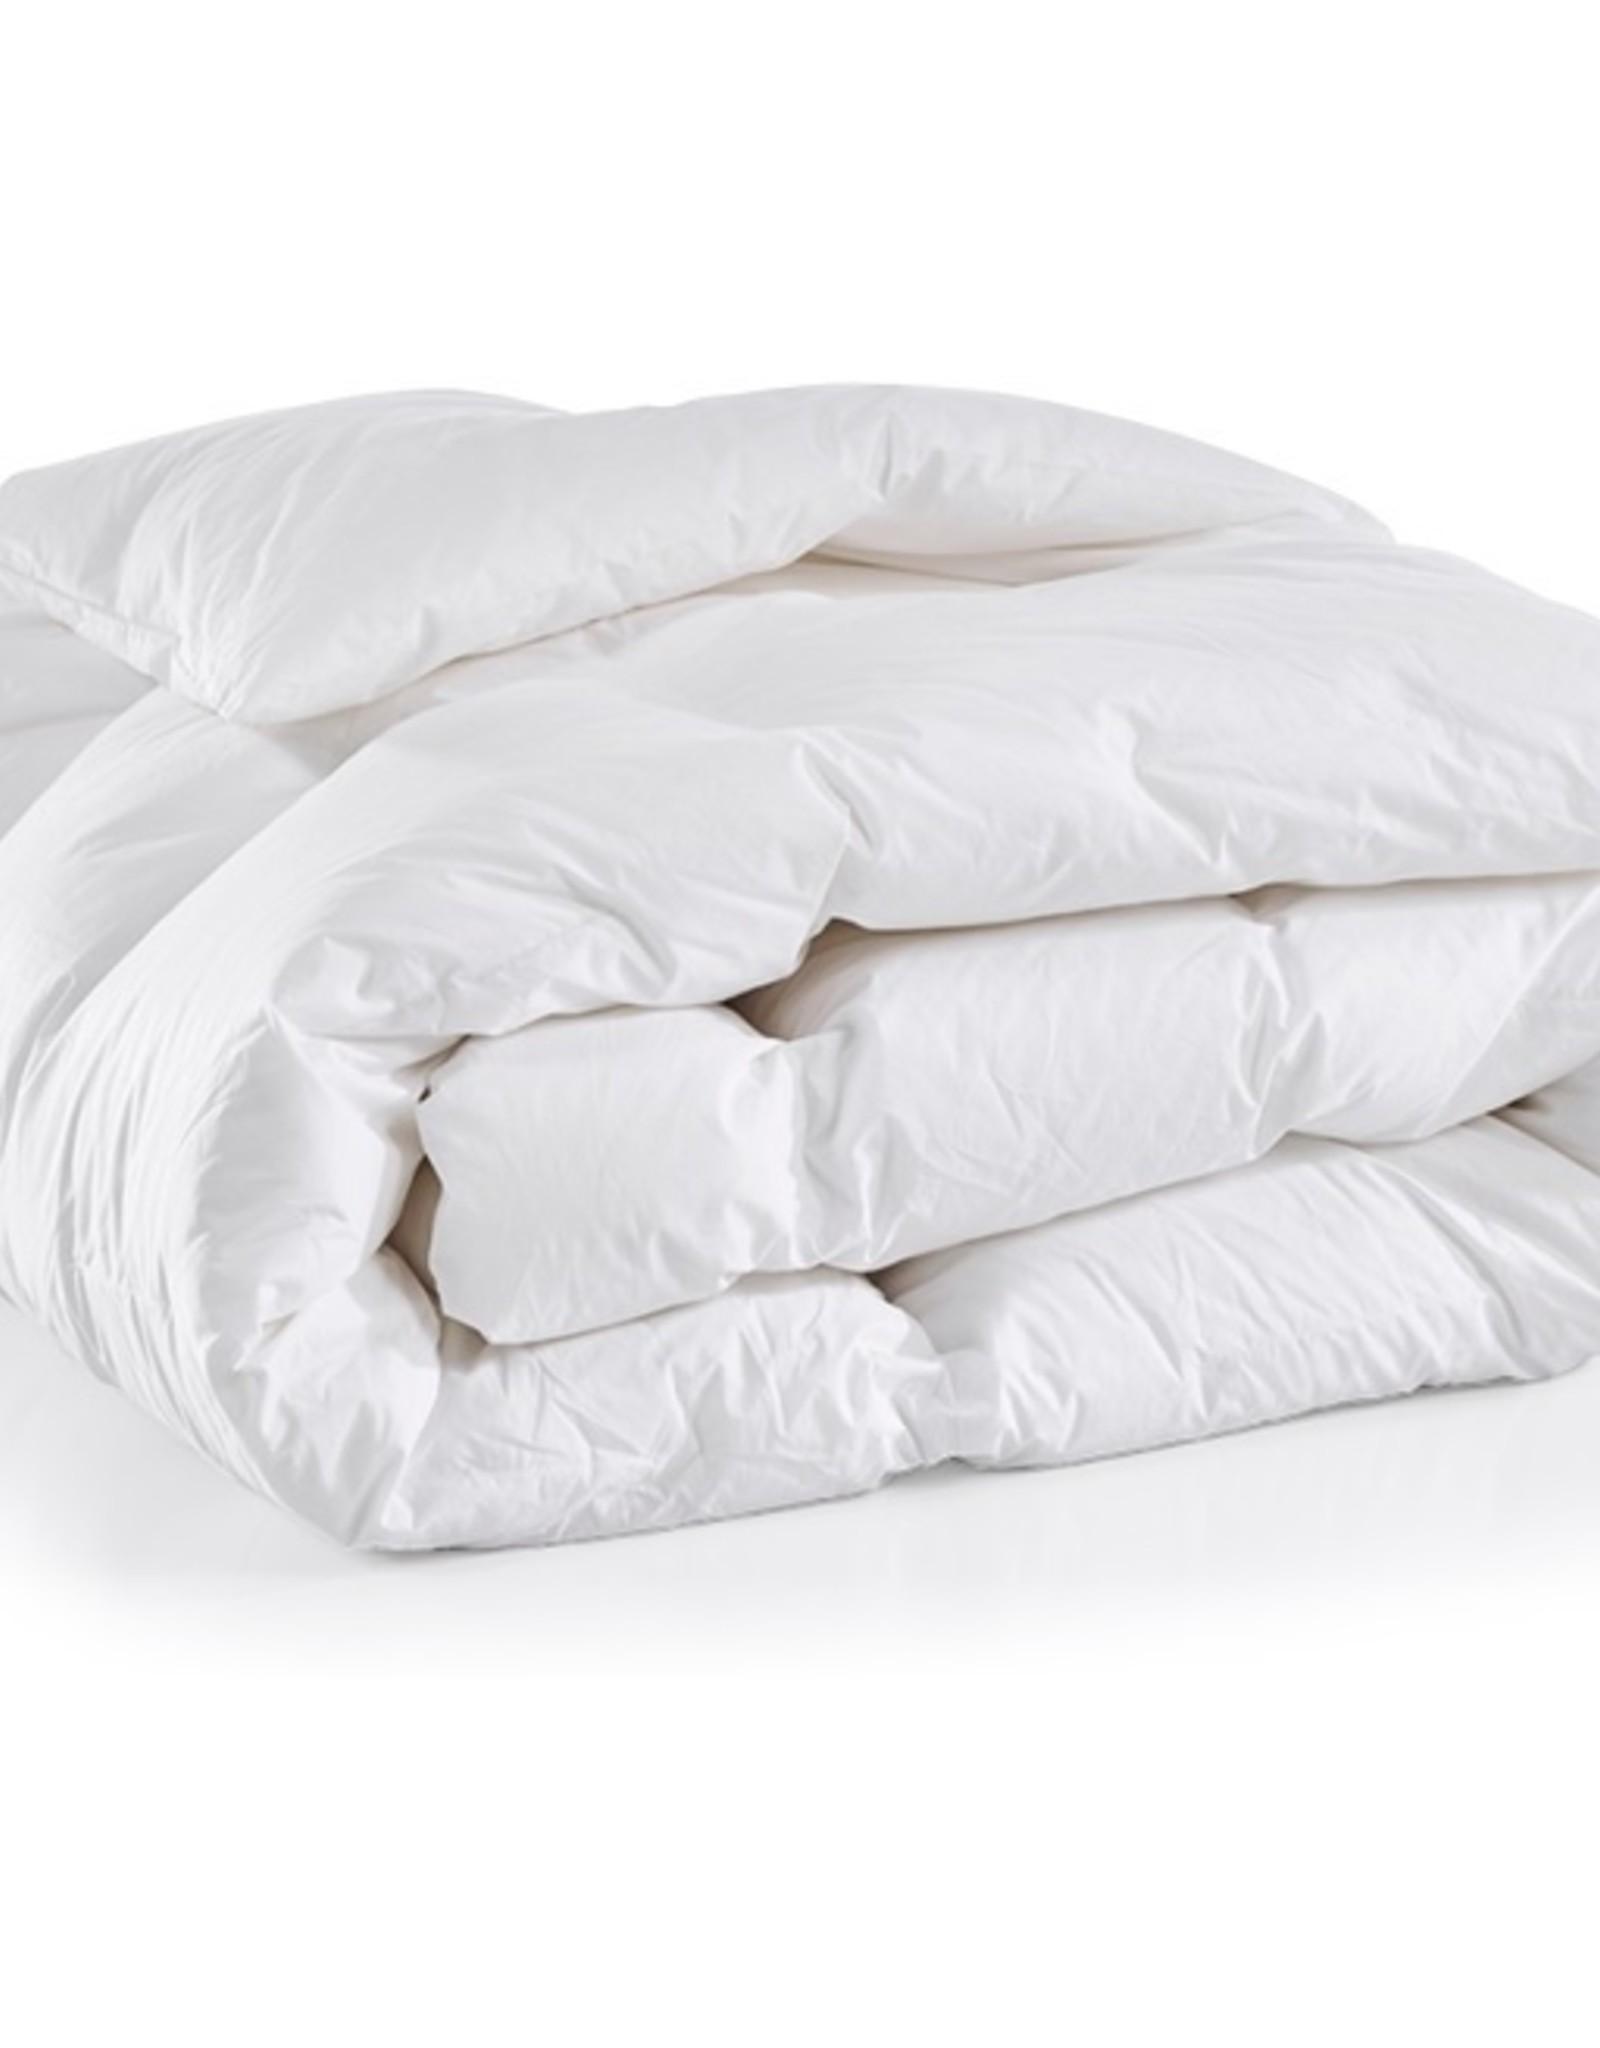 Sleepconsult Donsdeken Poolse 80% Winter